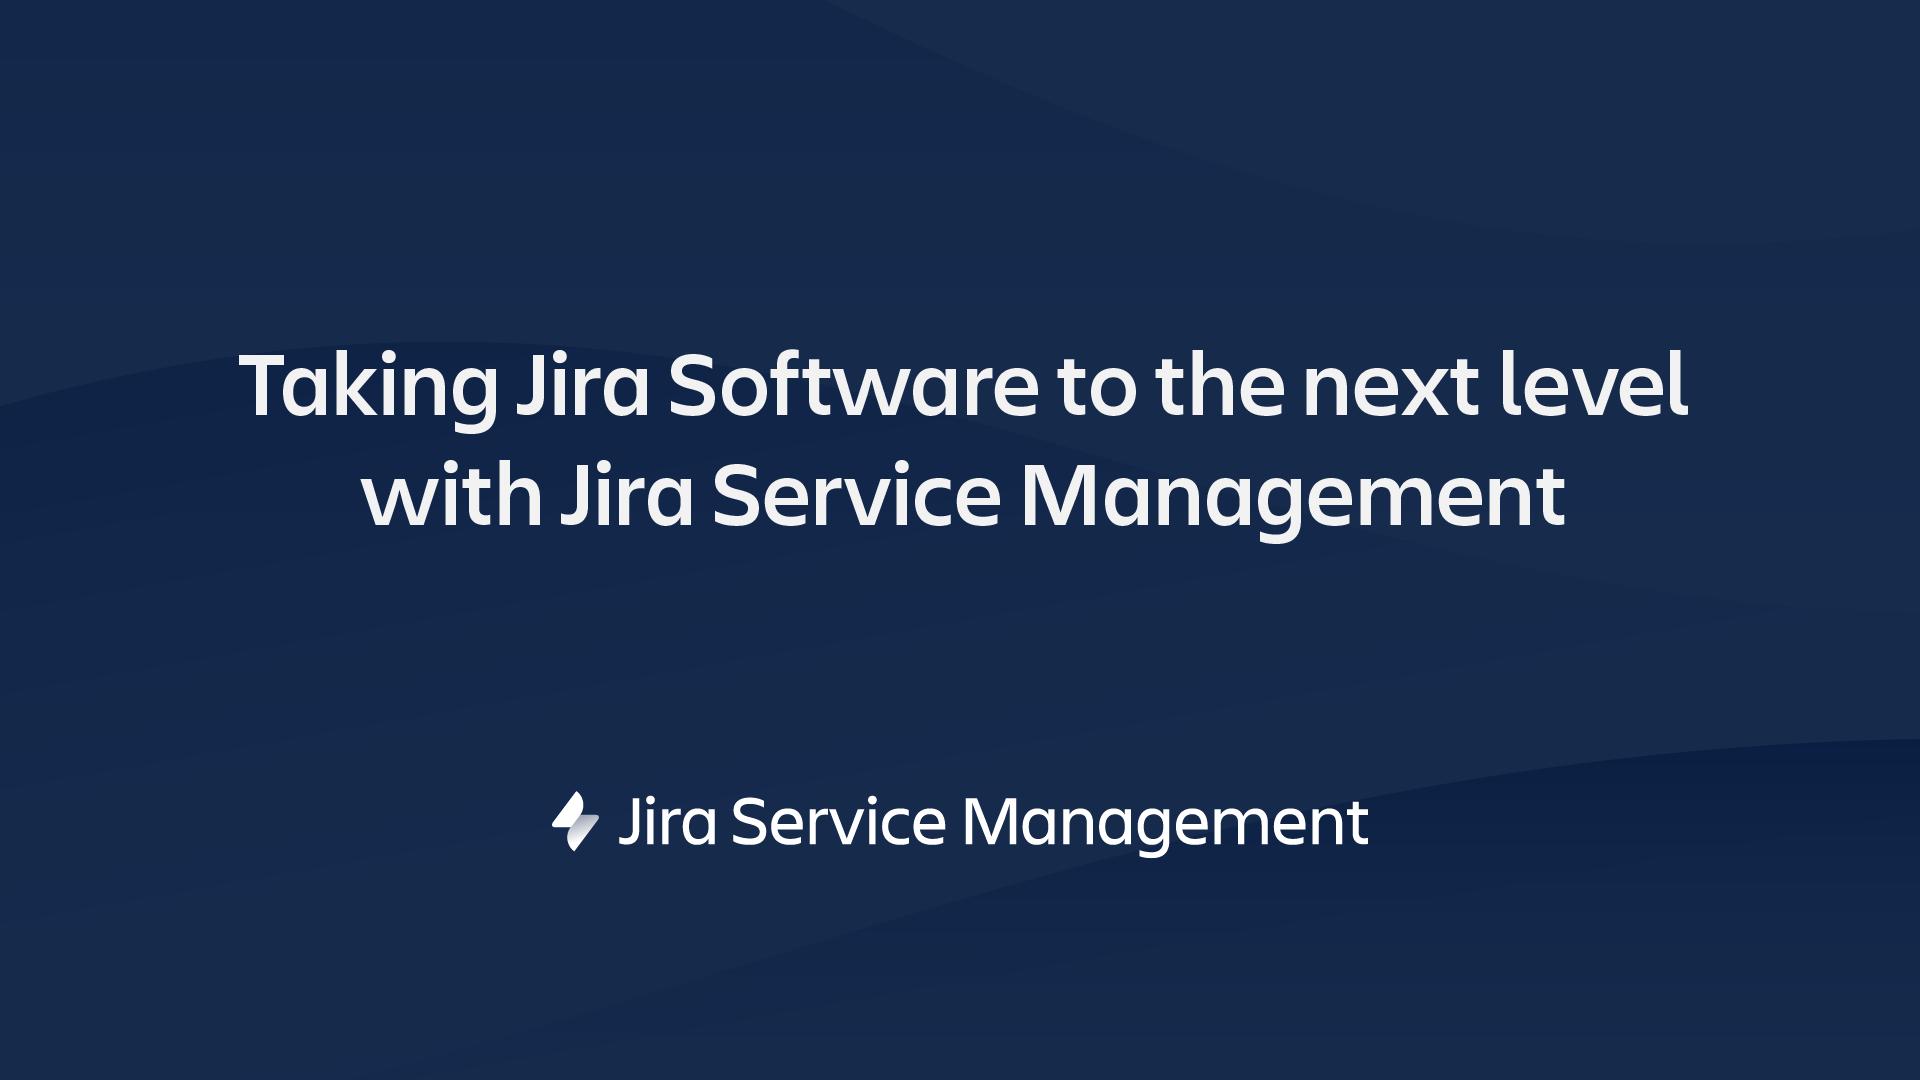 Jira Service Management video thumbnail